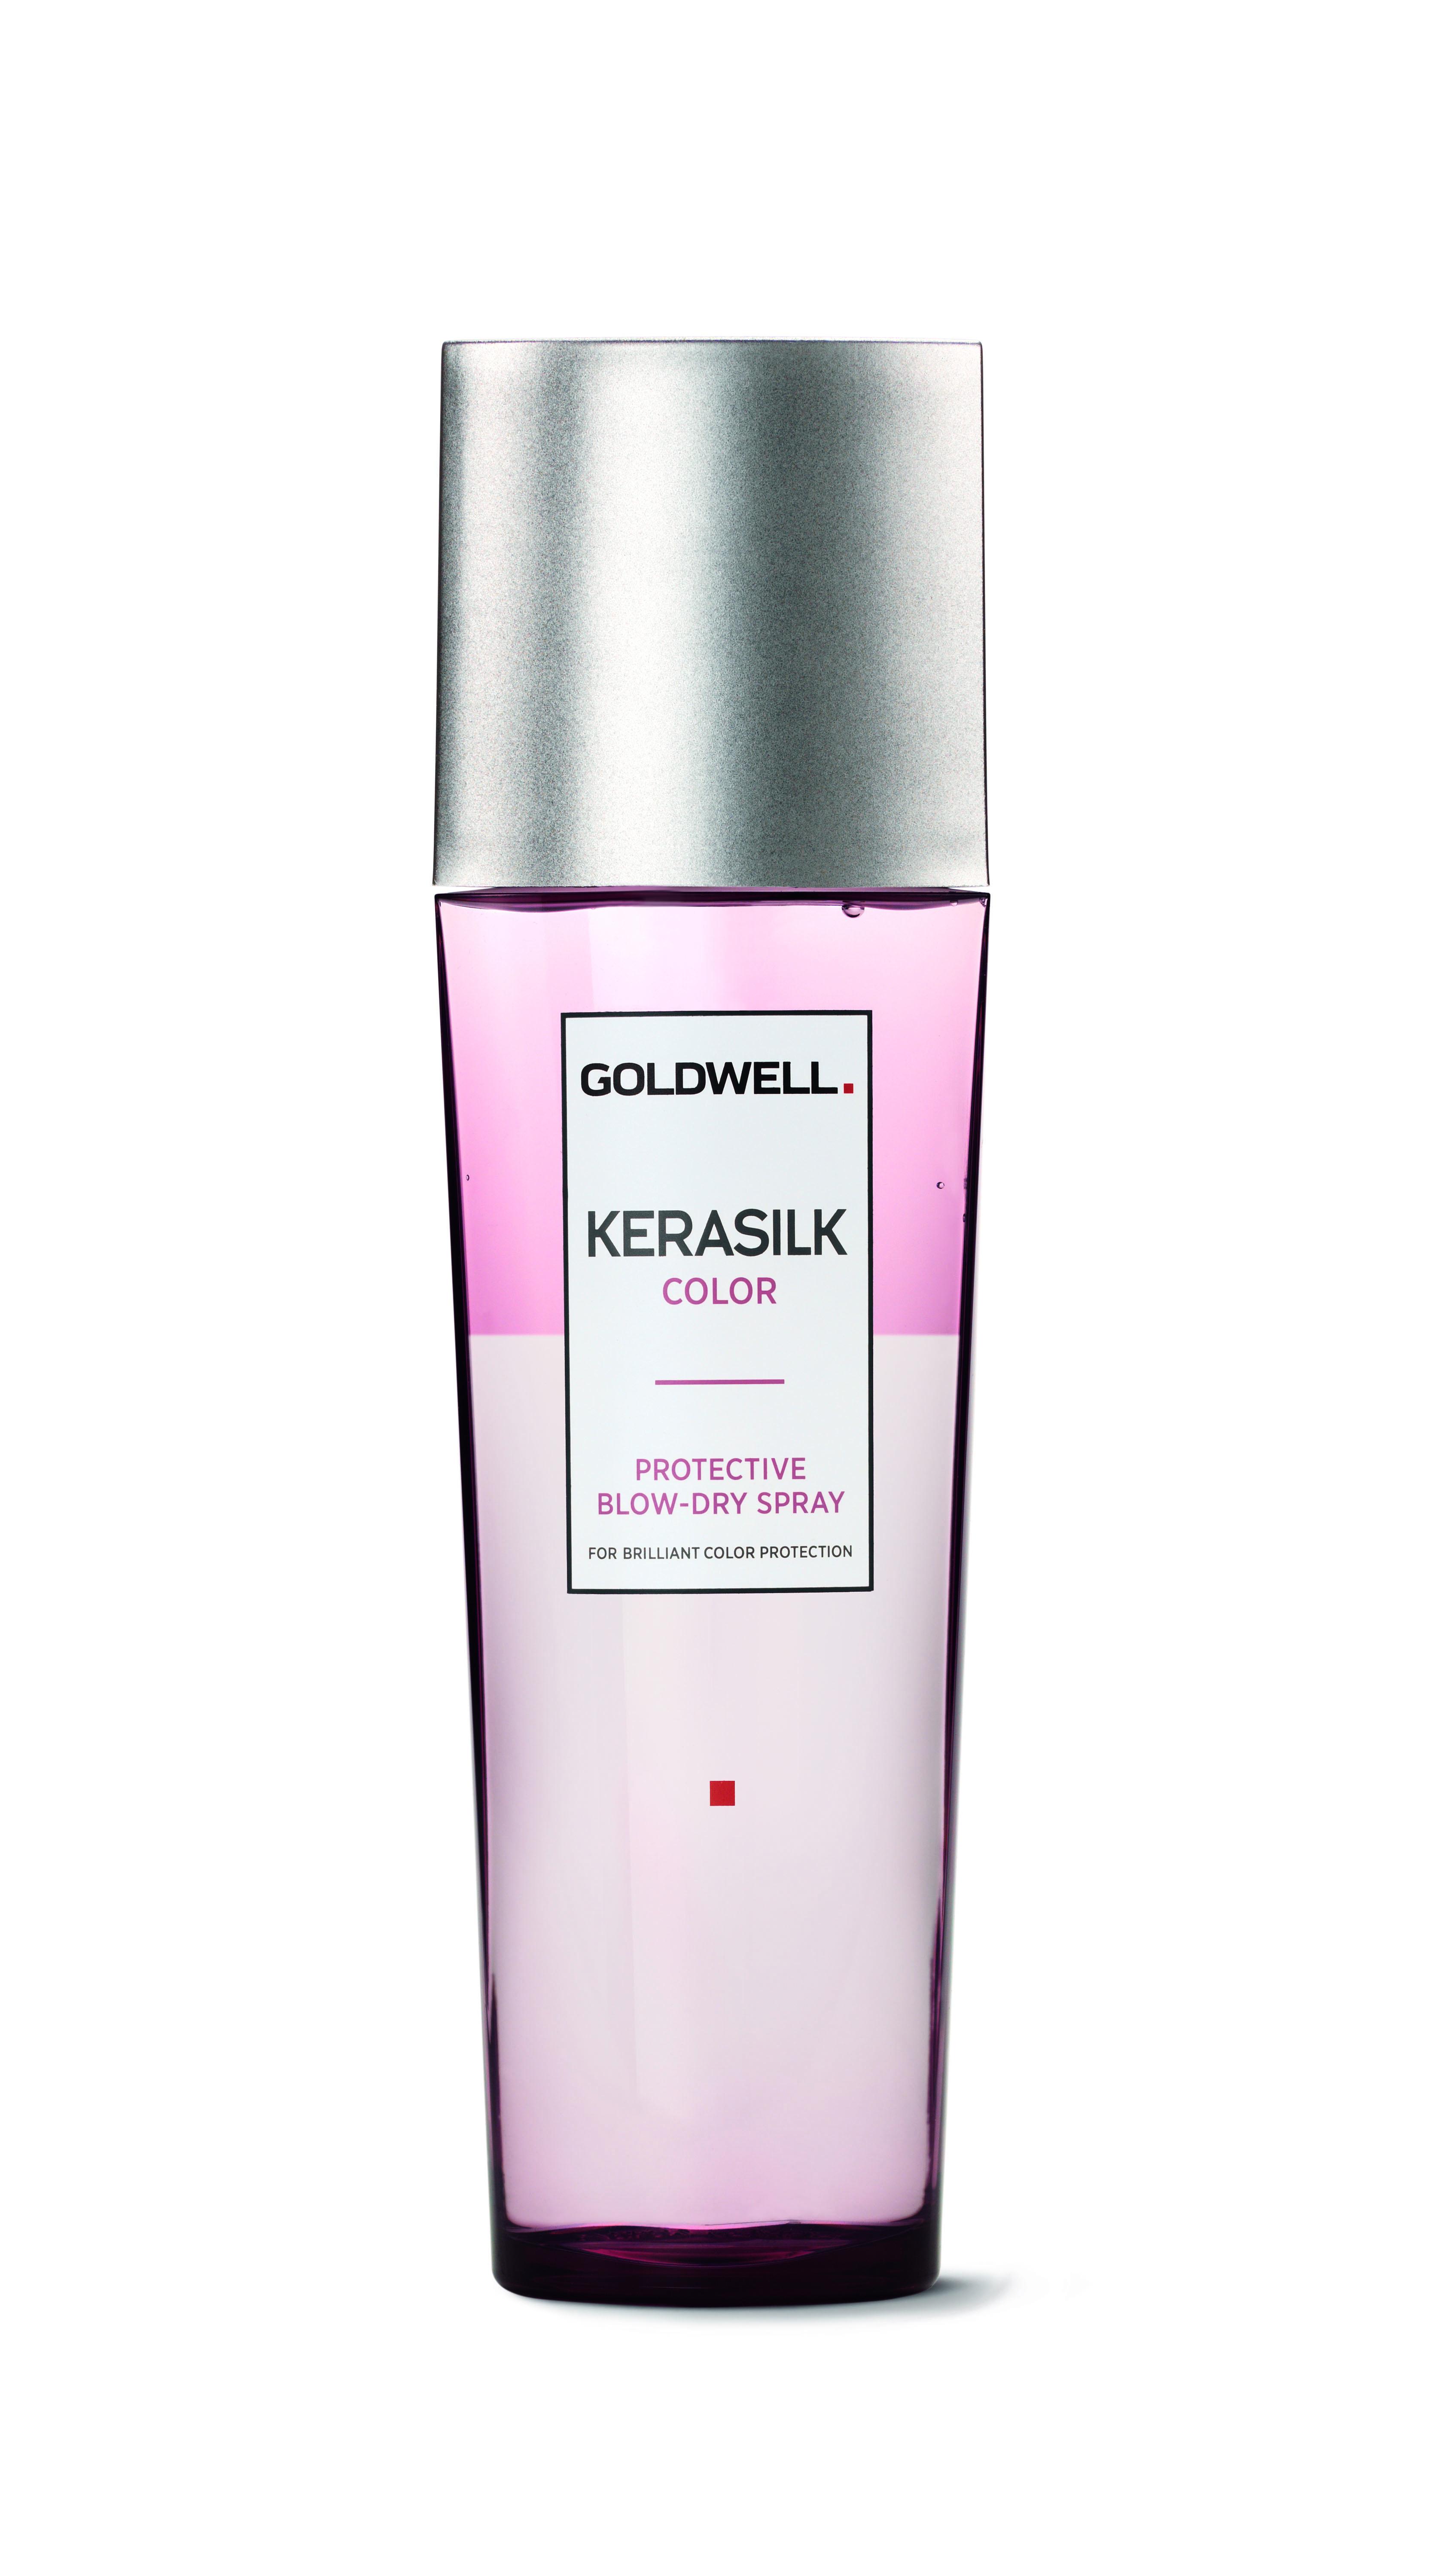 Kerasilk Color Blow-Dry Spray 125 ml